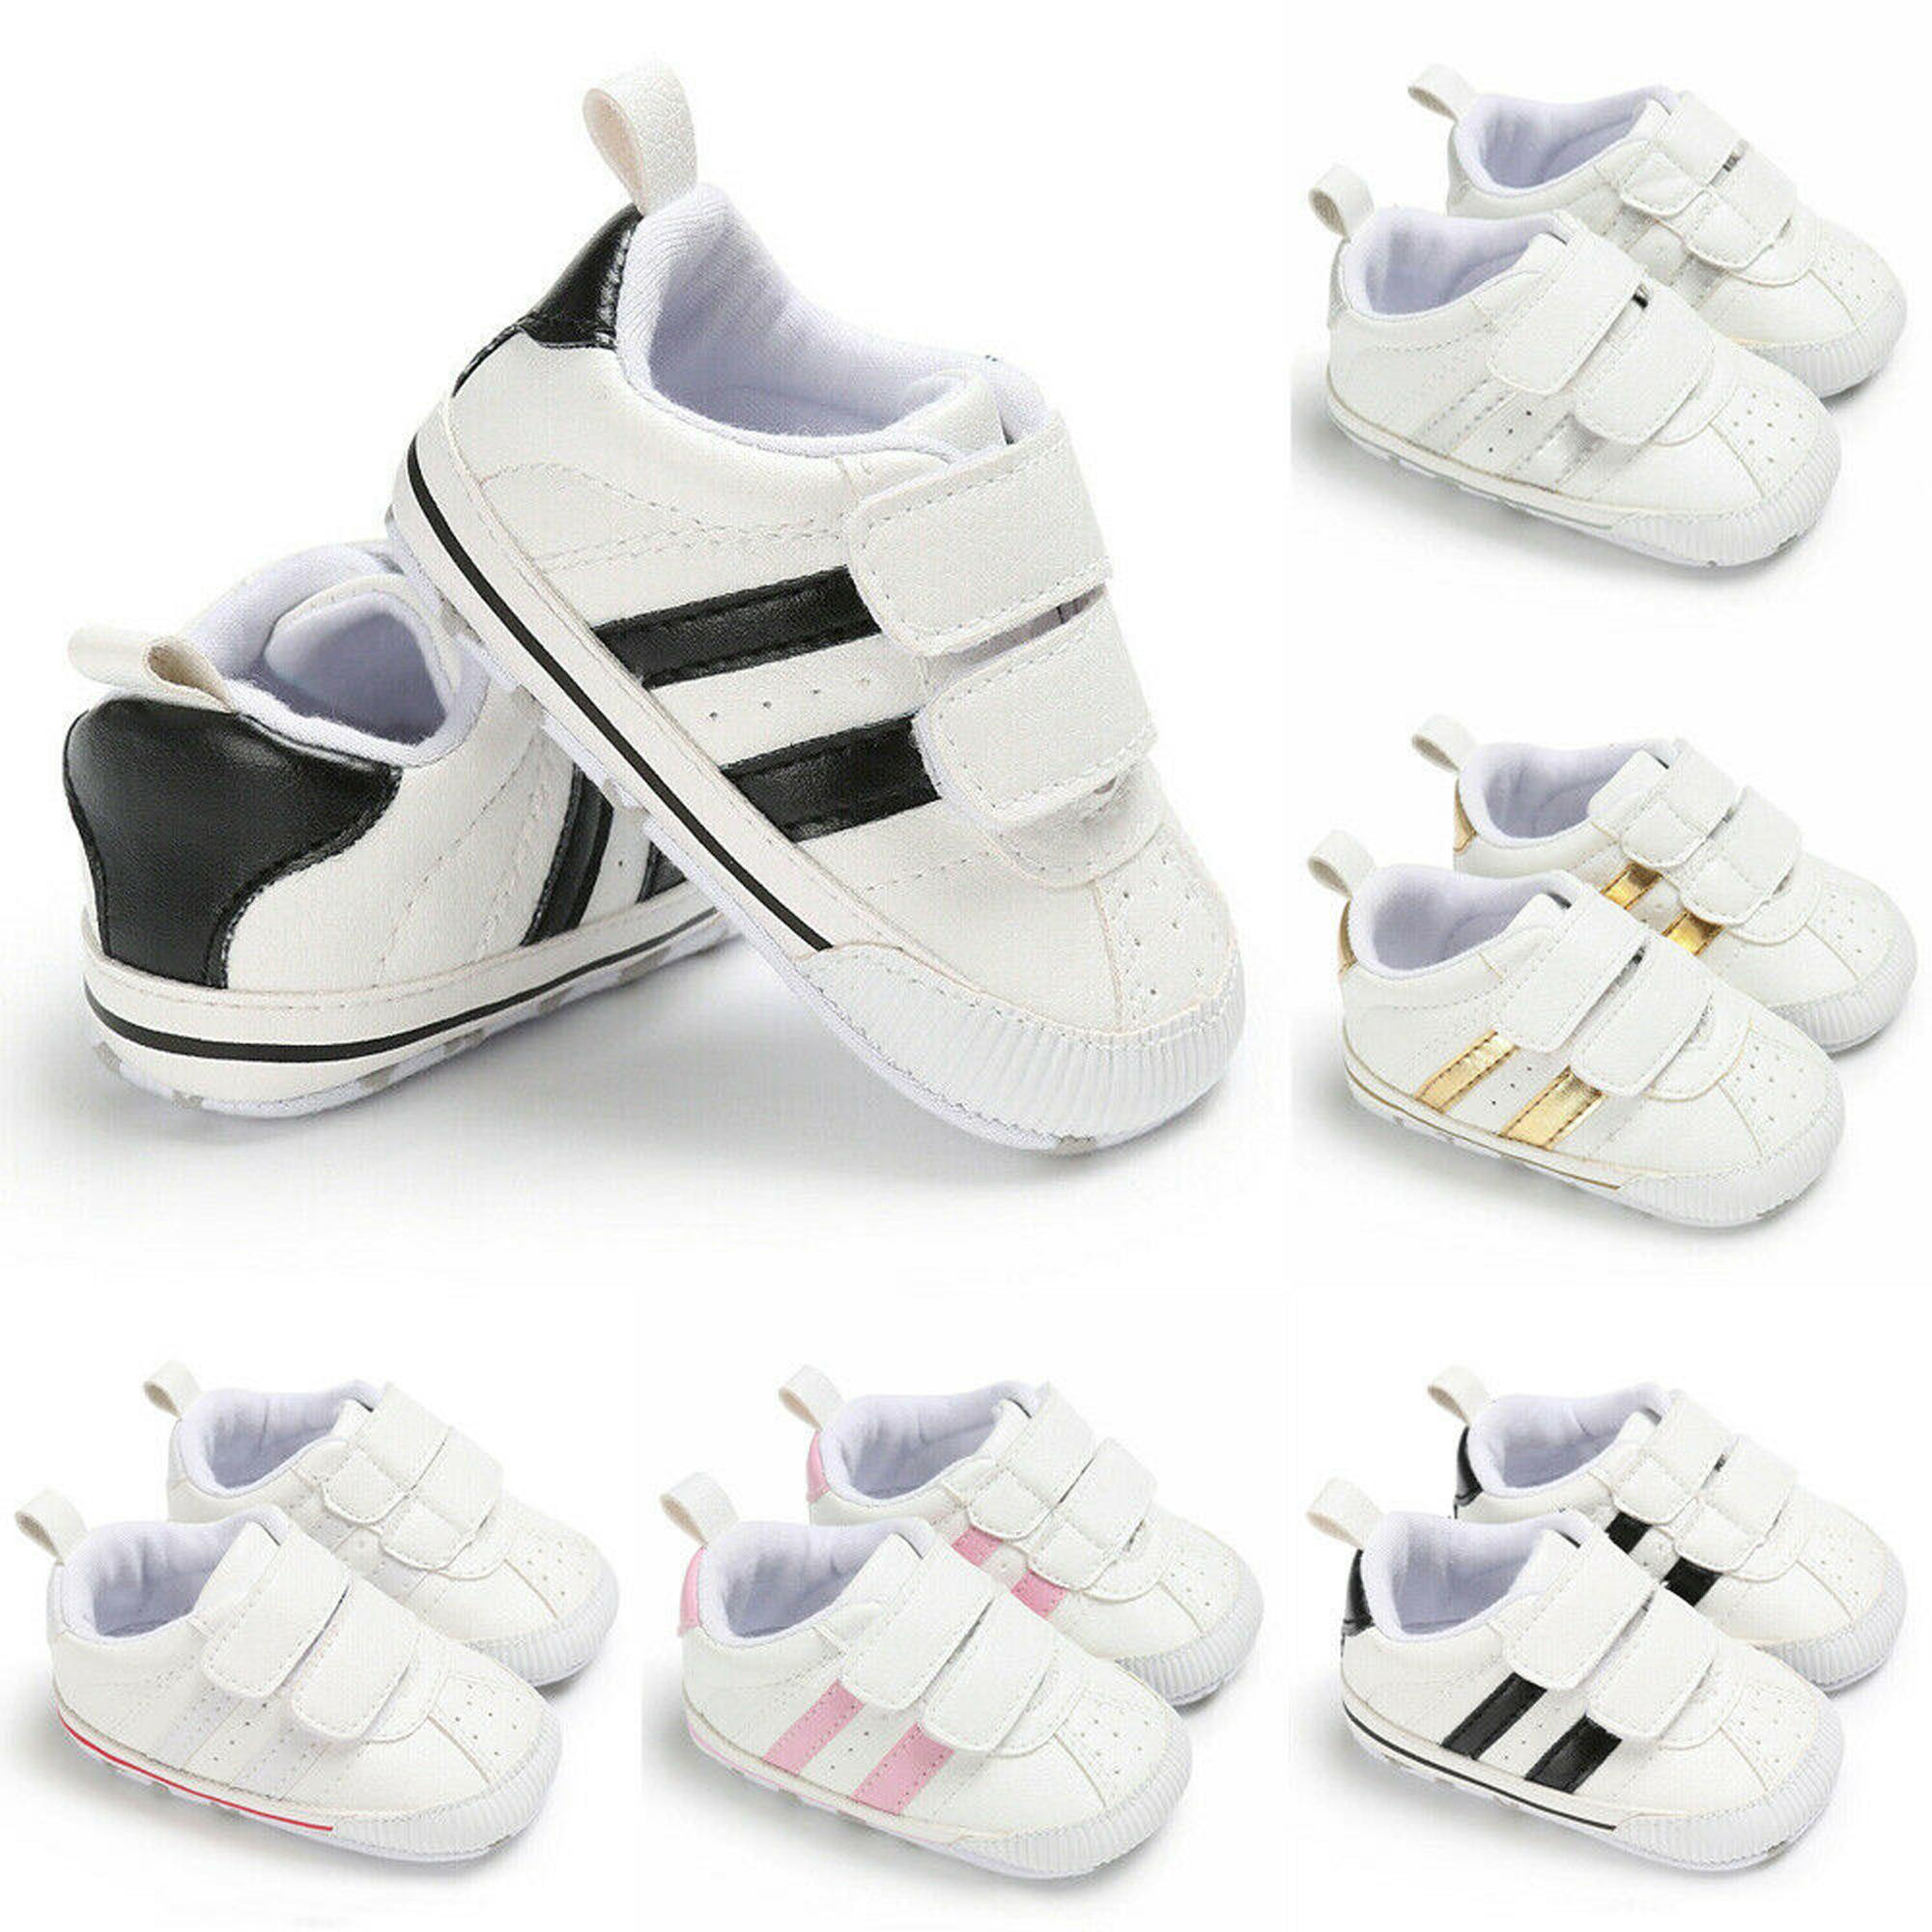 Infants Baby Boy Girl Summer Walking